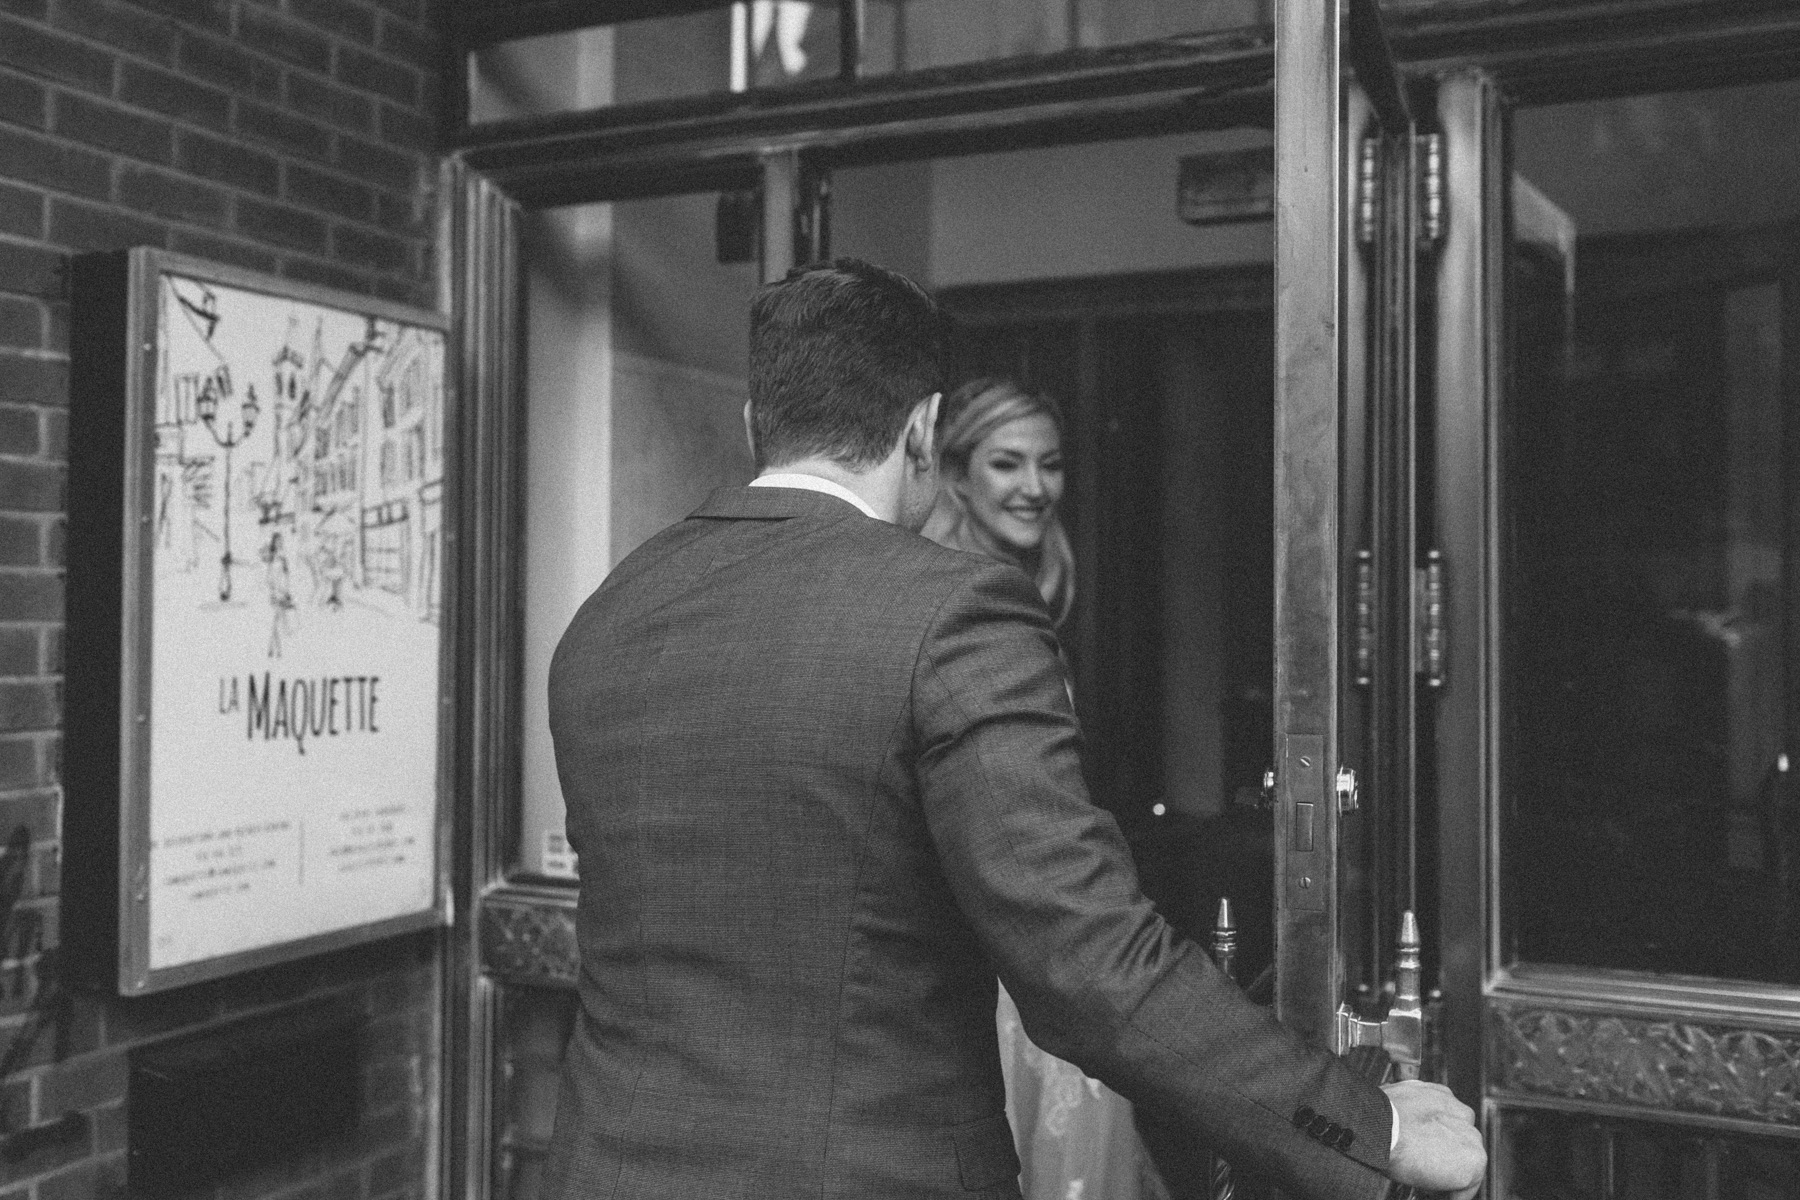 La-Maquette-wedding-by-Toronto-modern-wedding-photographer-Sam-Wong_36.jpg